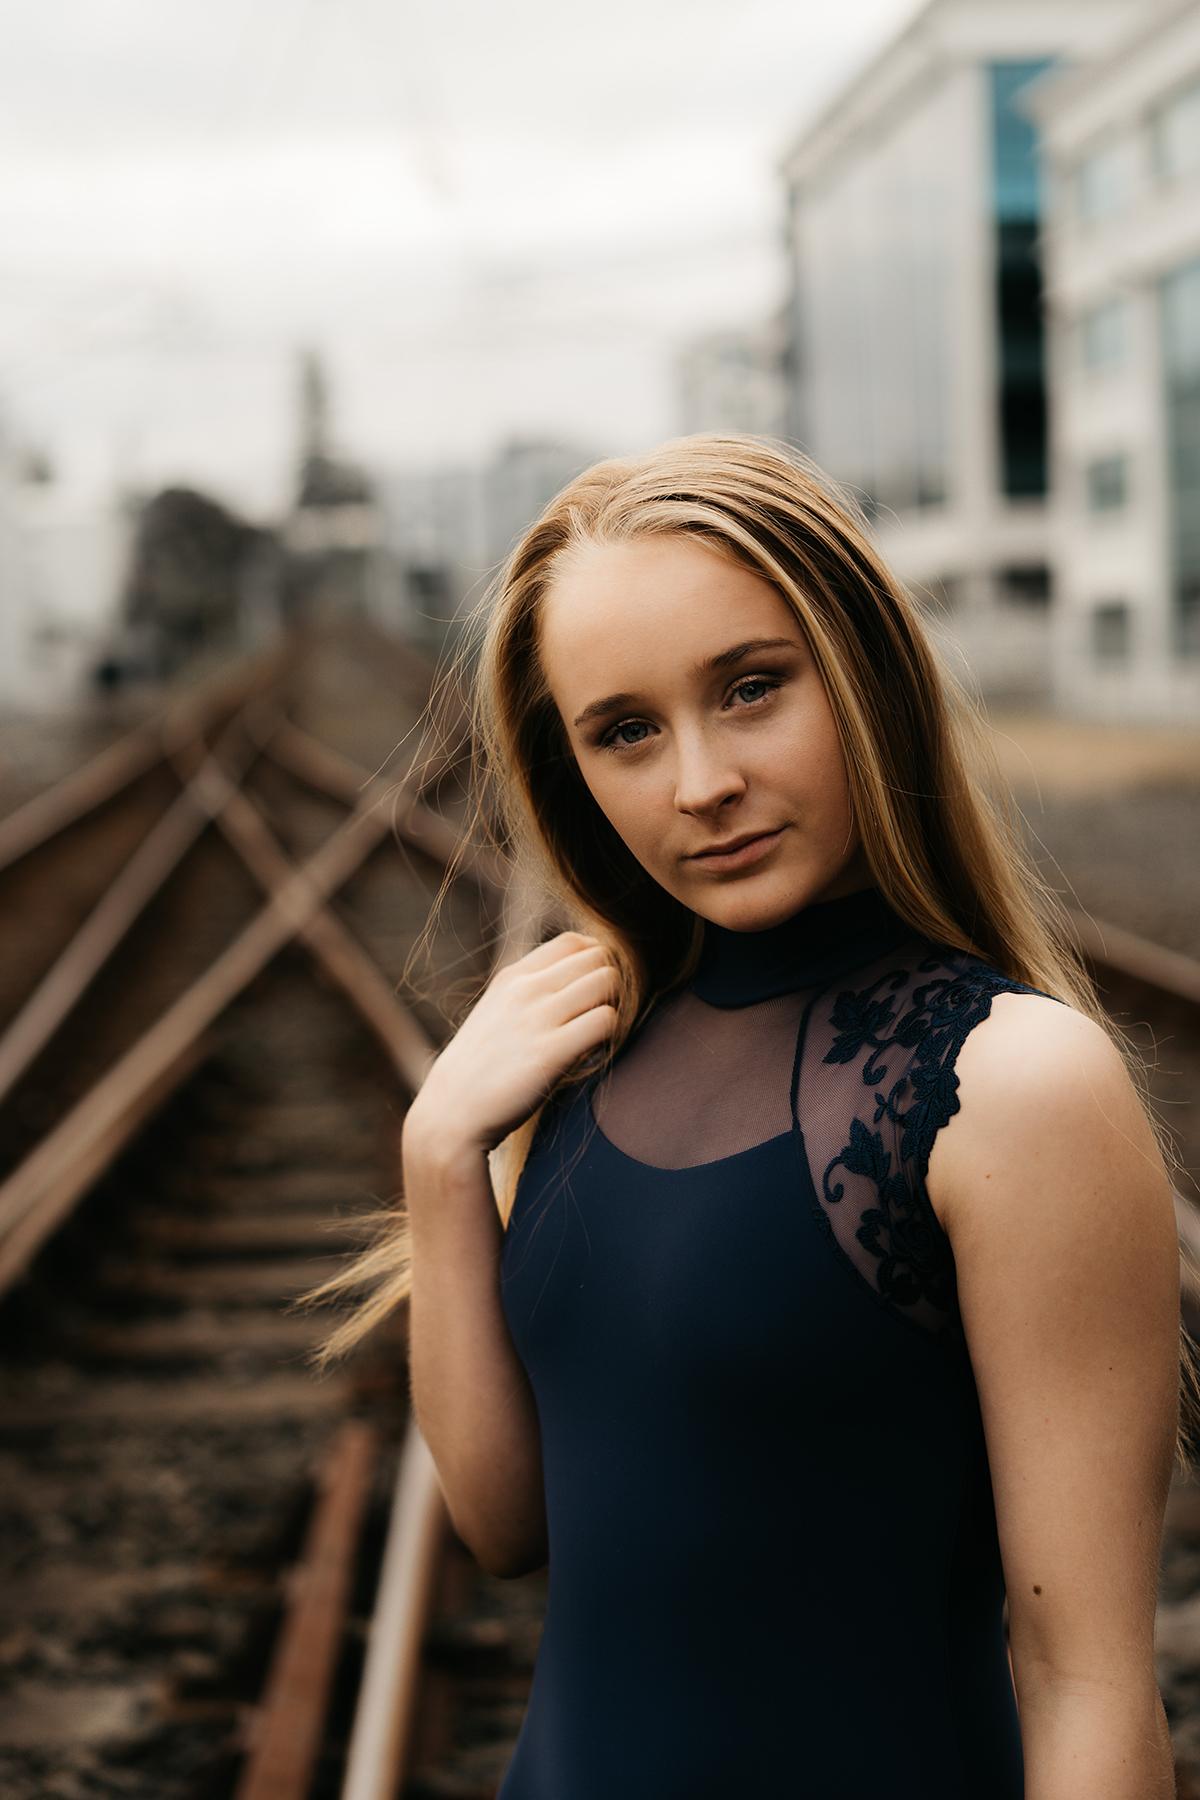 Keelia_Kennychickphotos-48.jpg